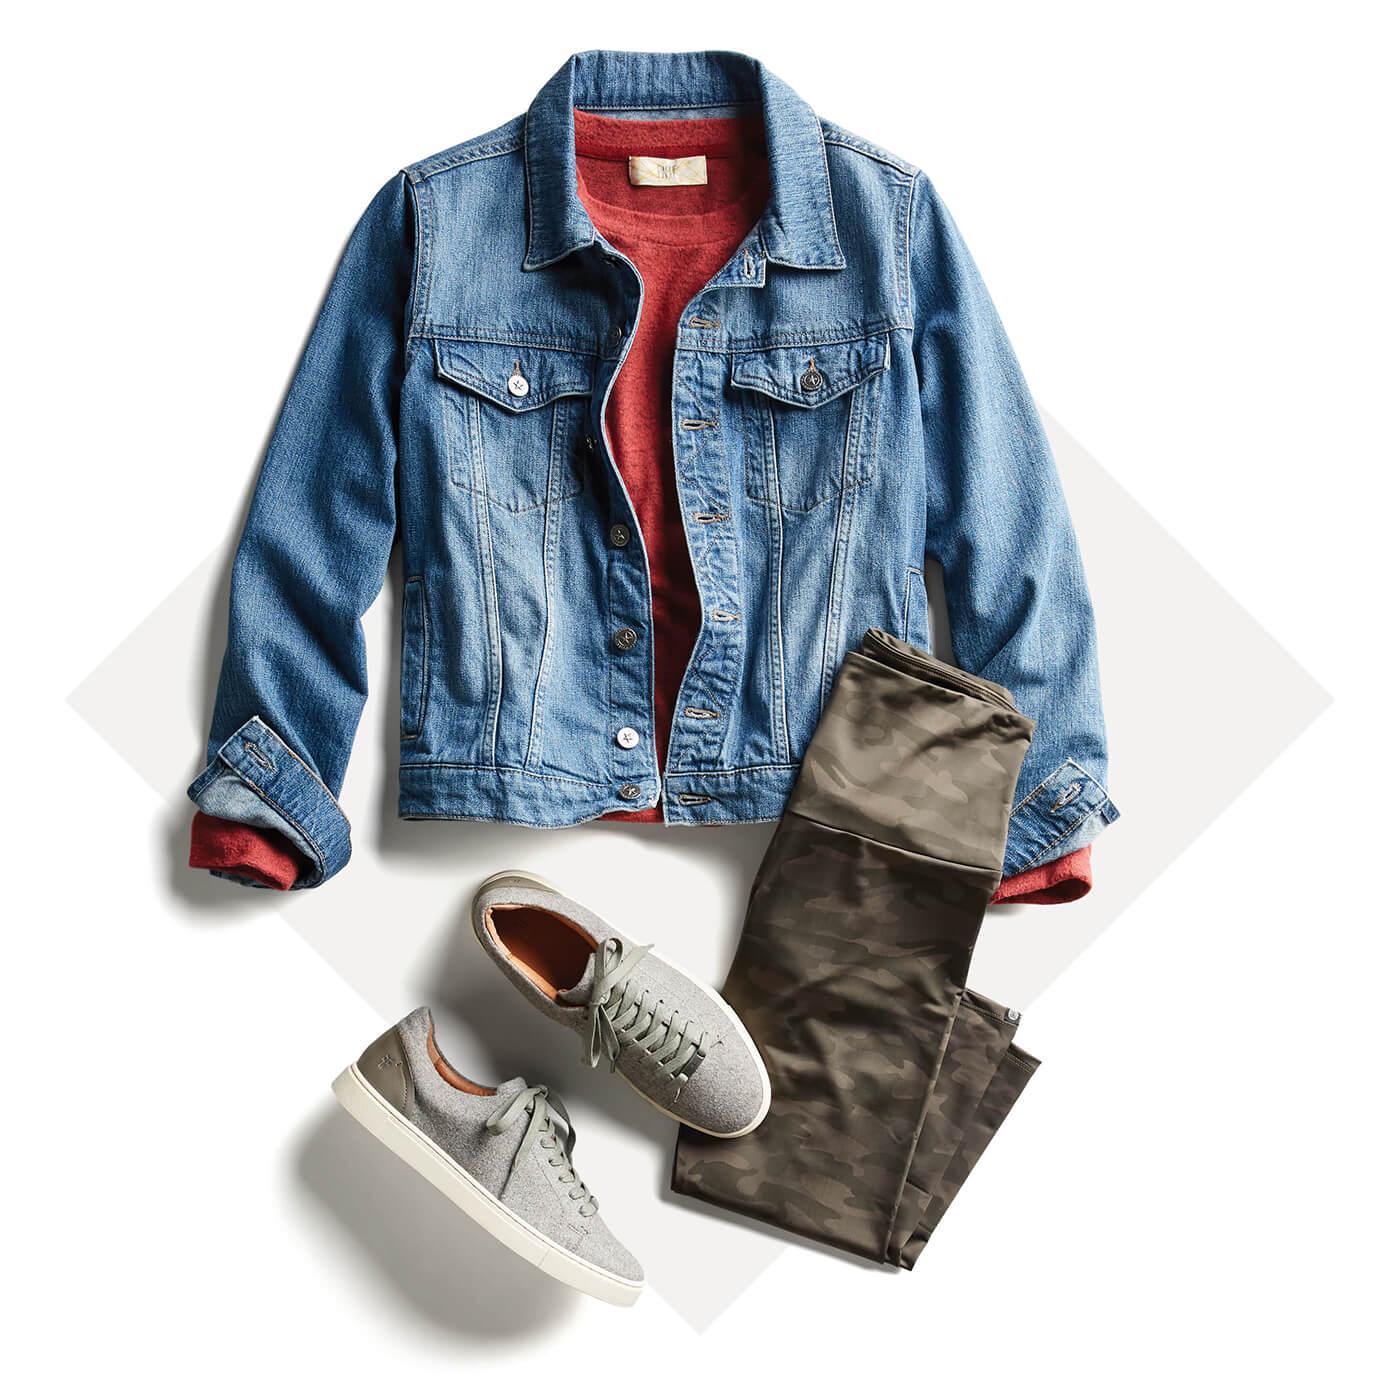 camo joggers and denim jacket